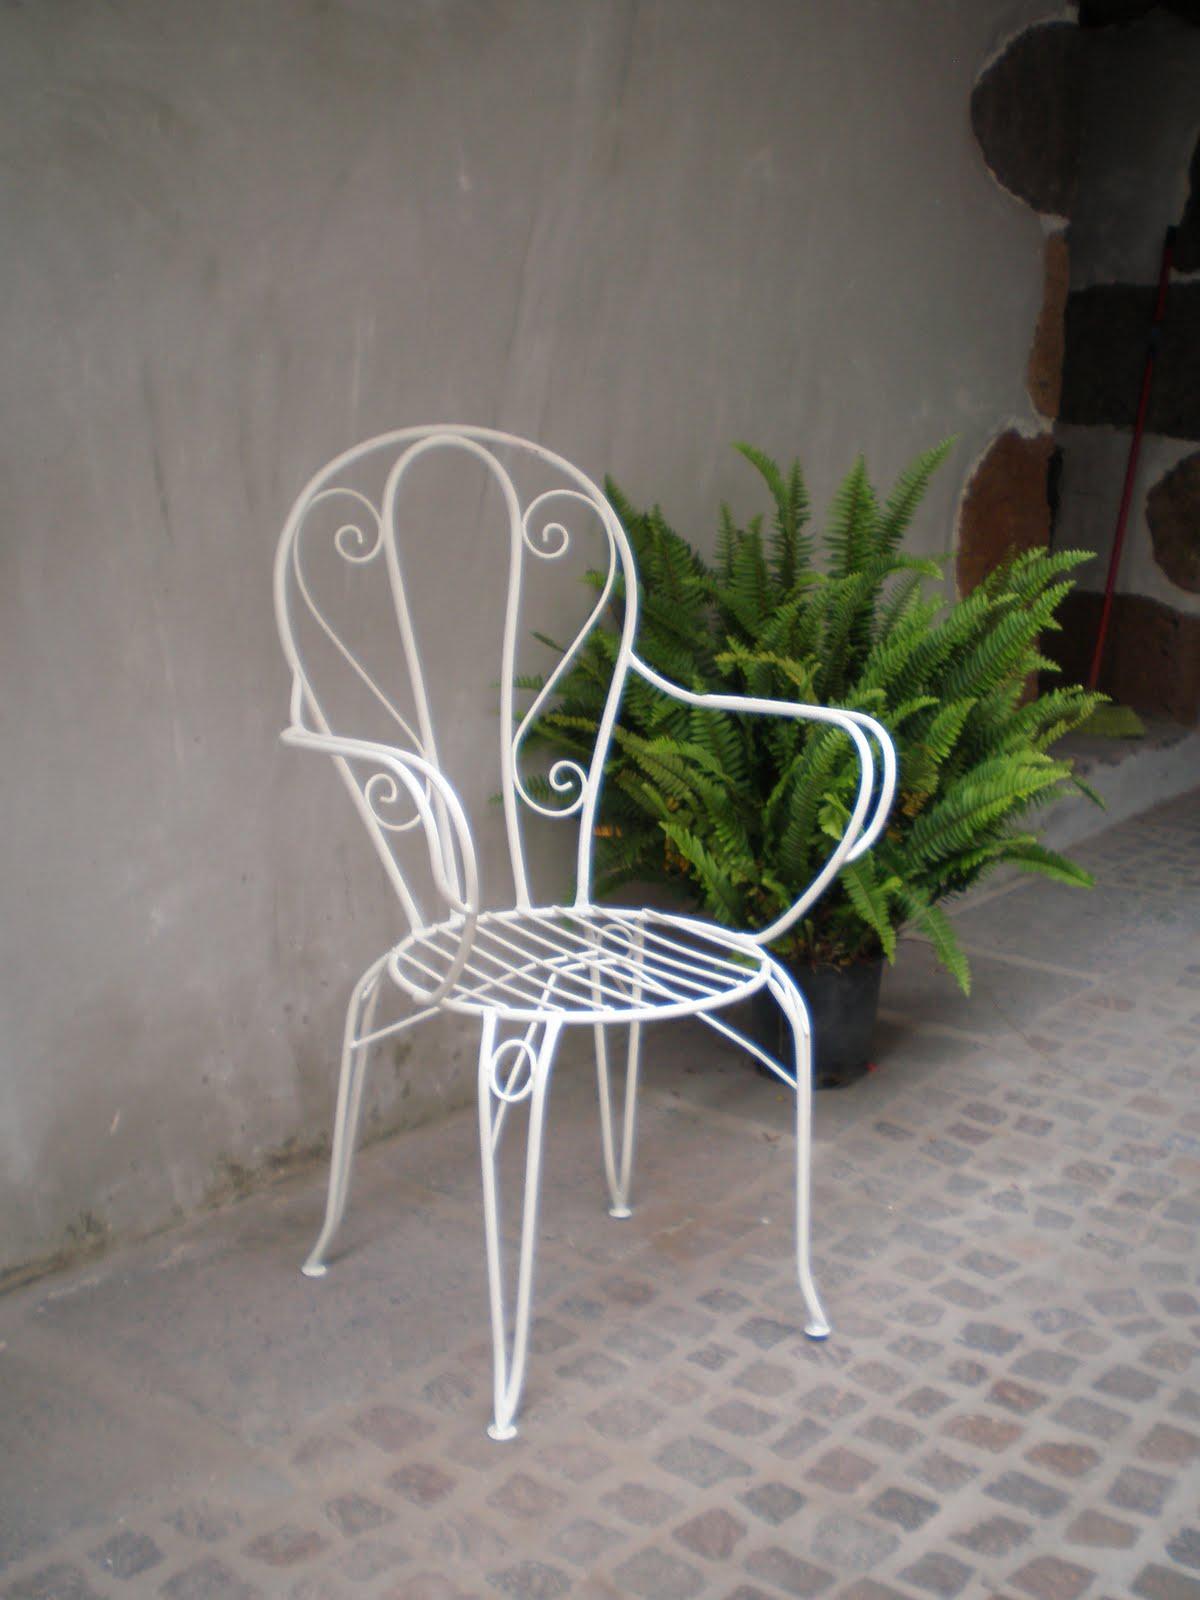 Dentrodelagaveta sillas de forja recuperadas for Sillas de forja baratas